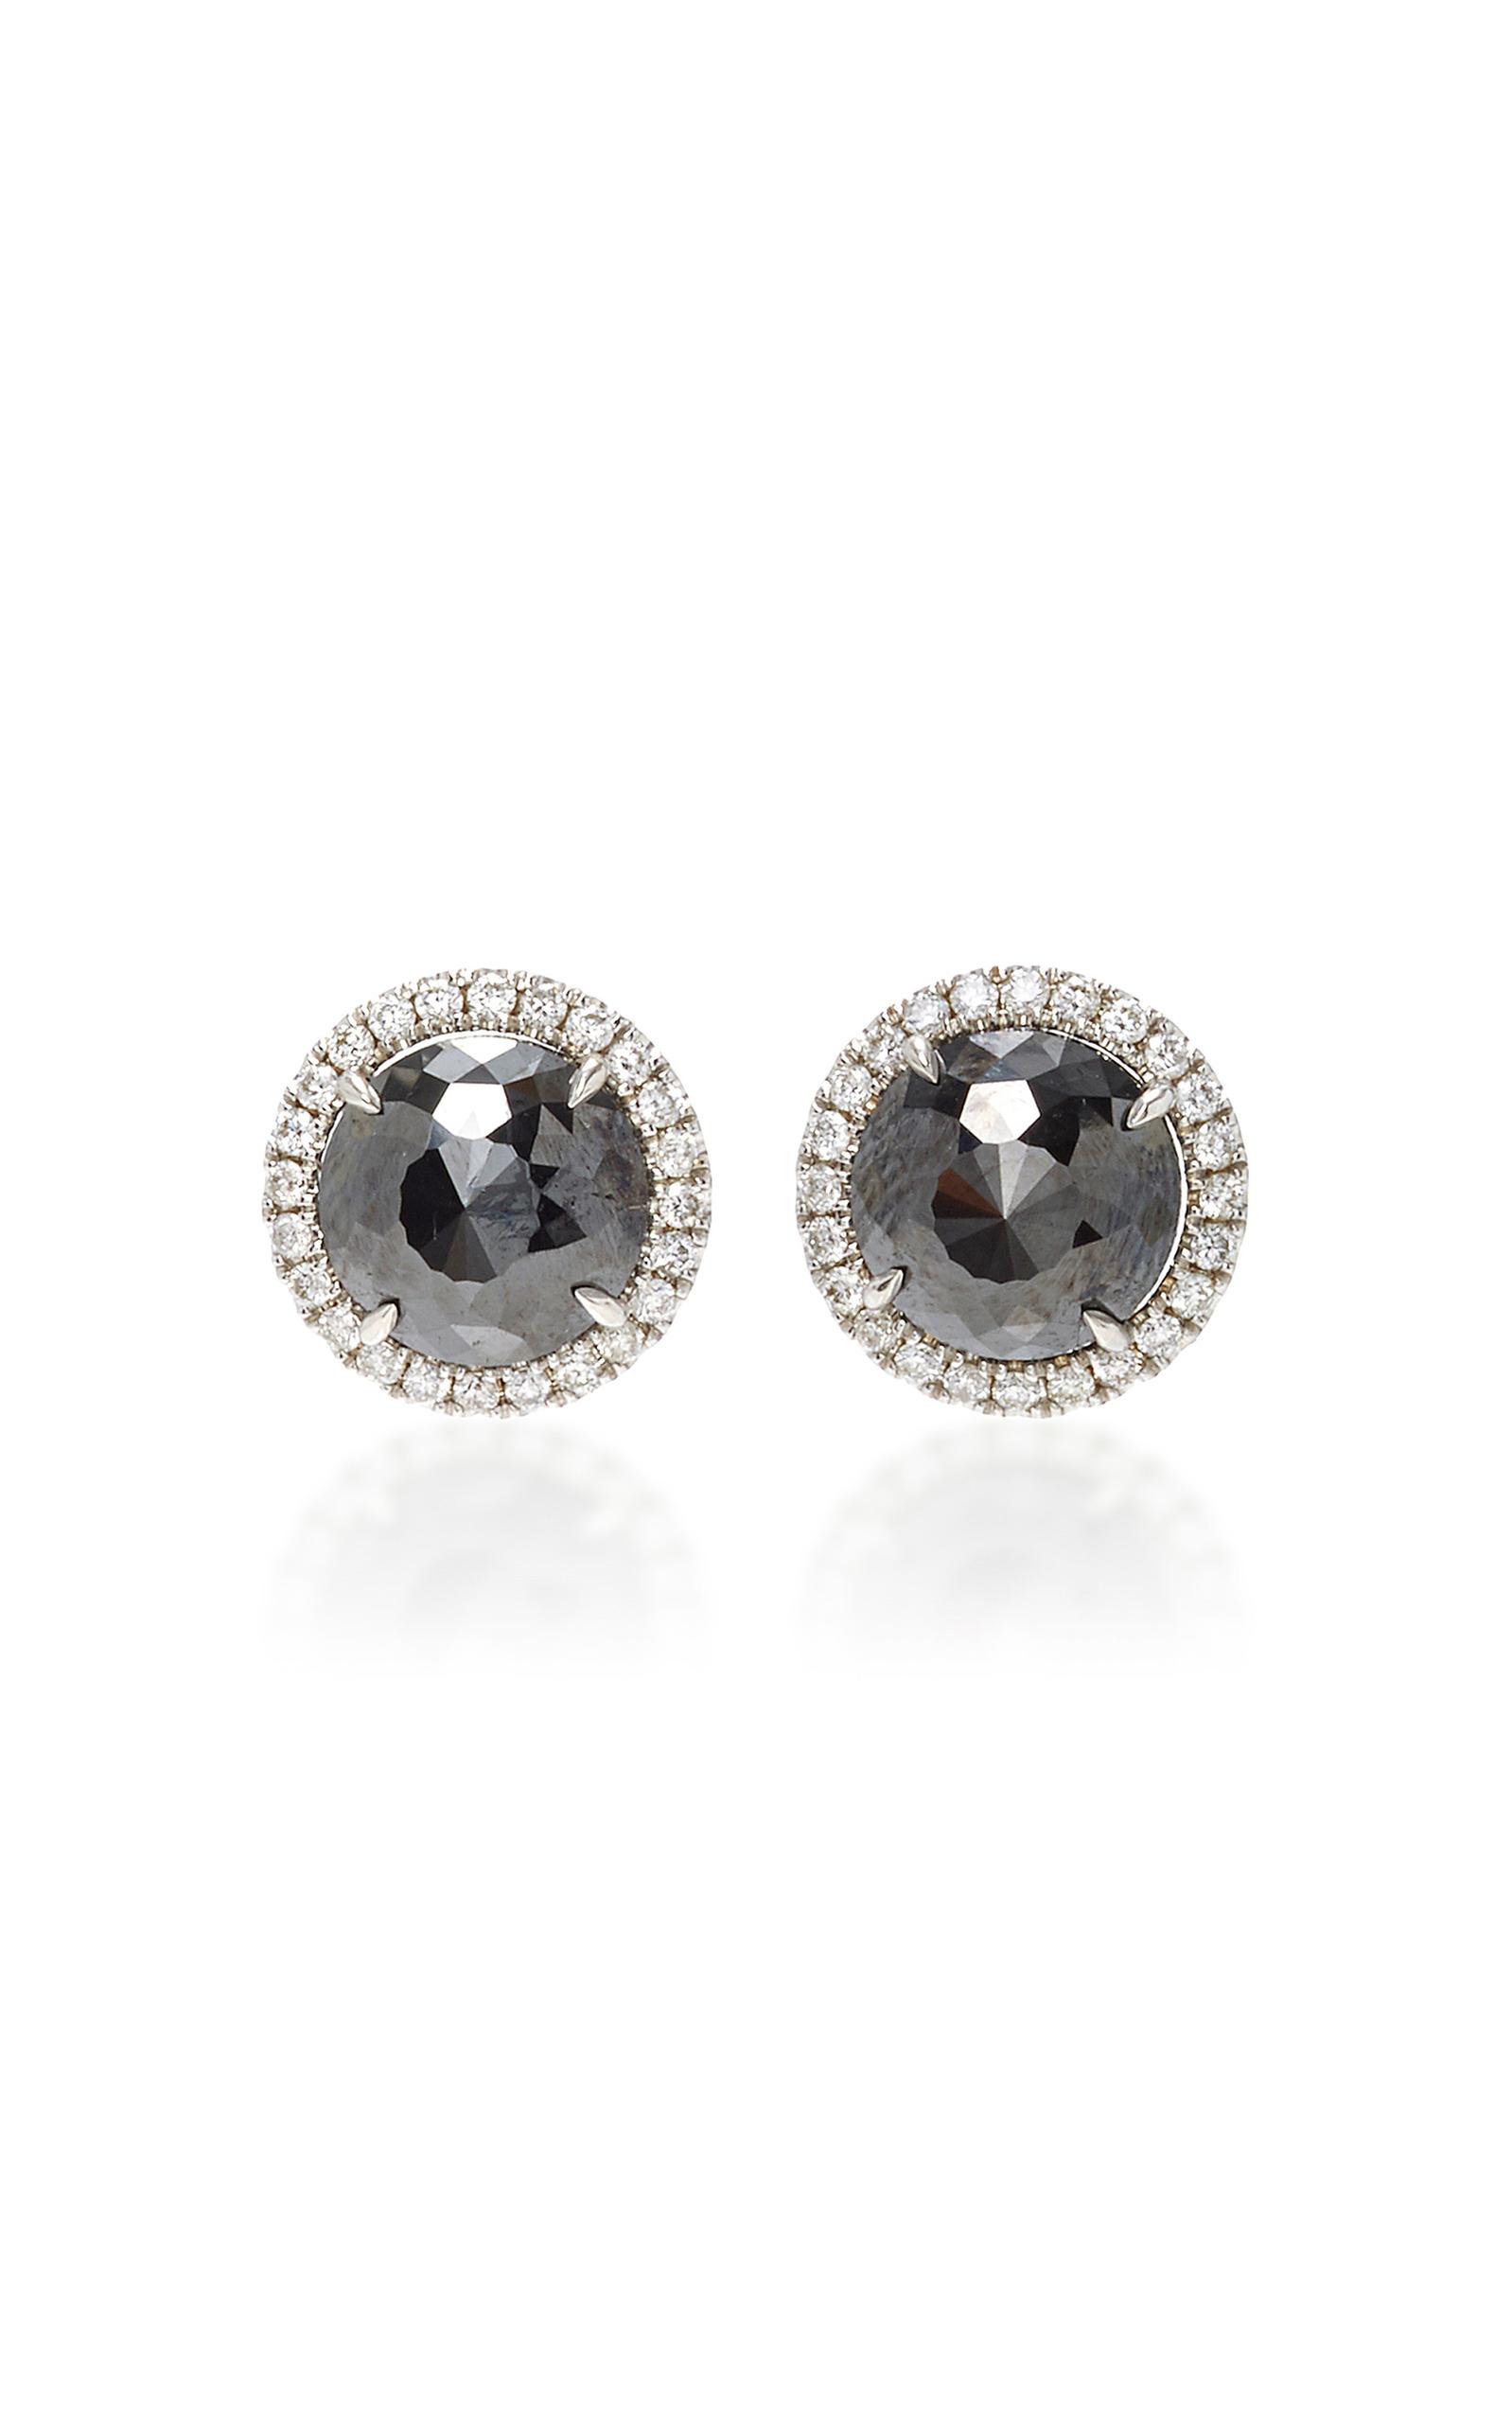 Round Rose Cut Black Diamond Stud Earrings by Nina